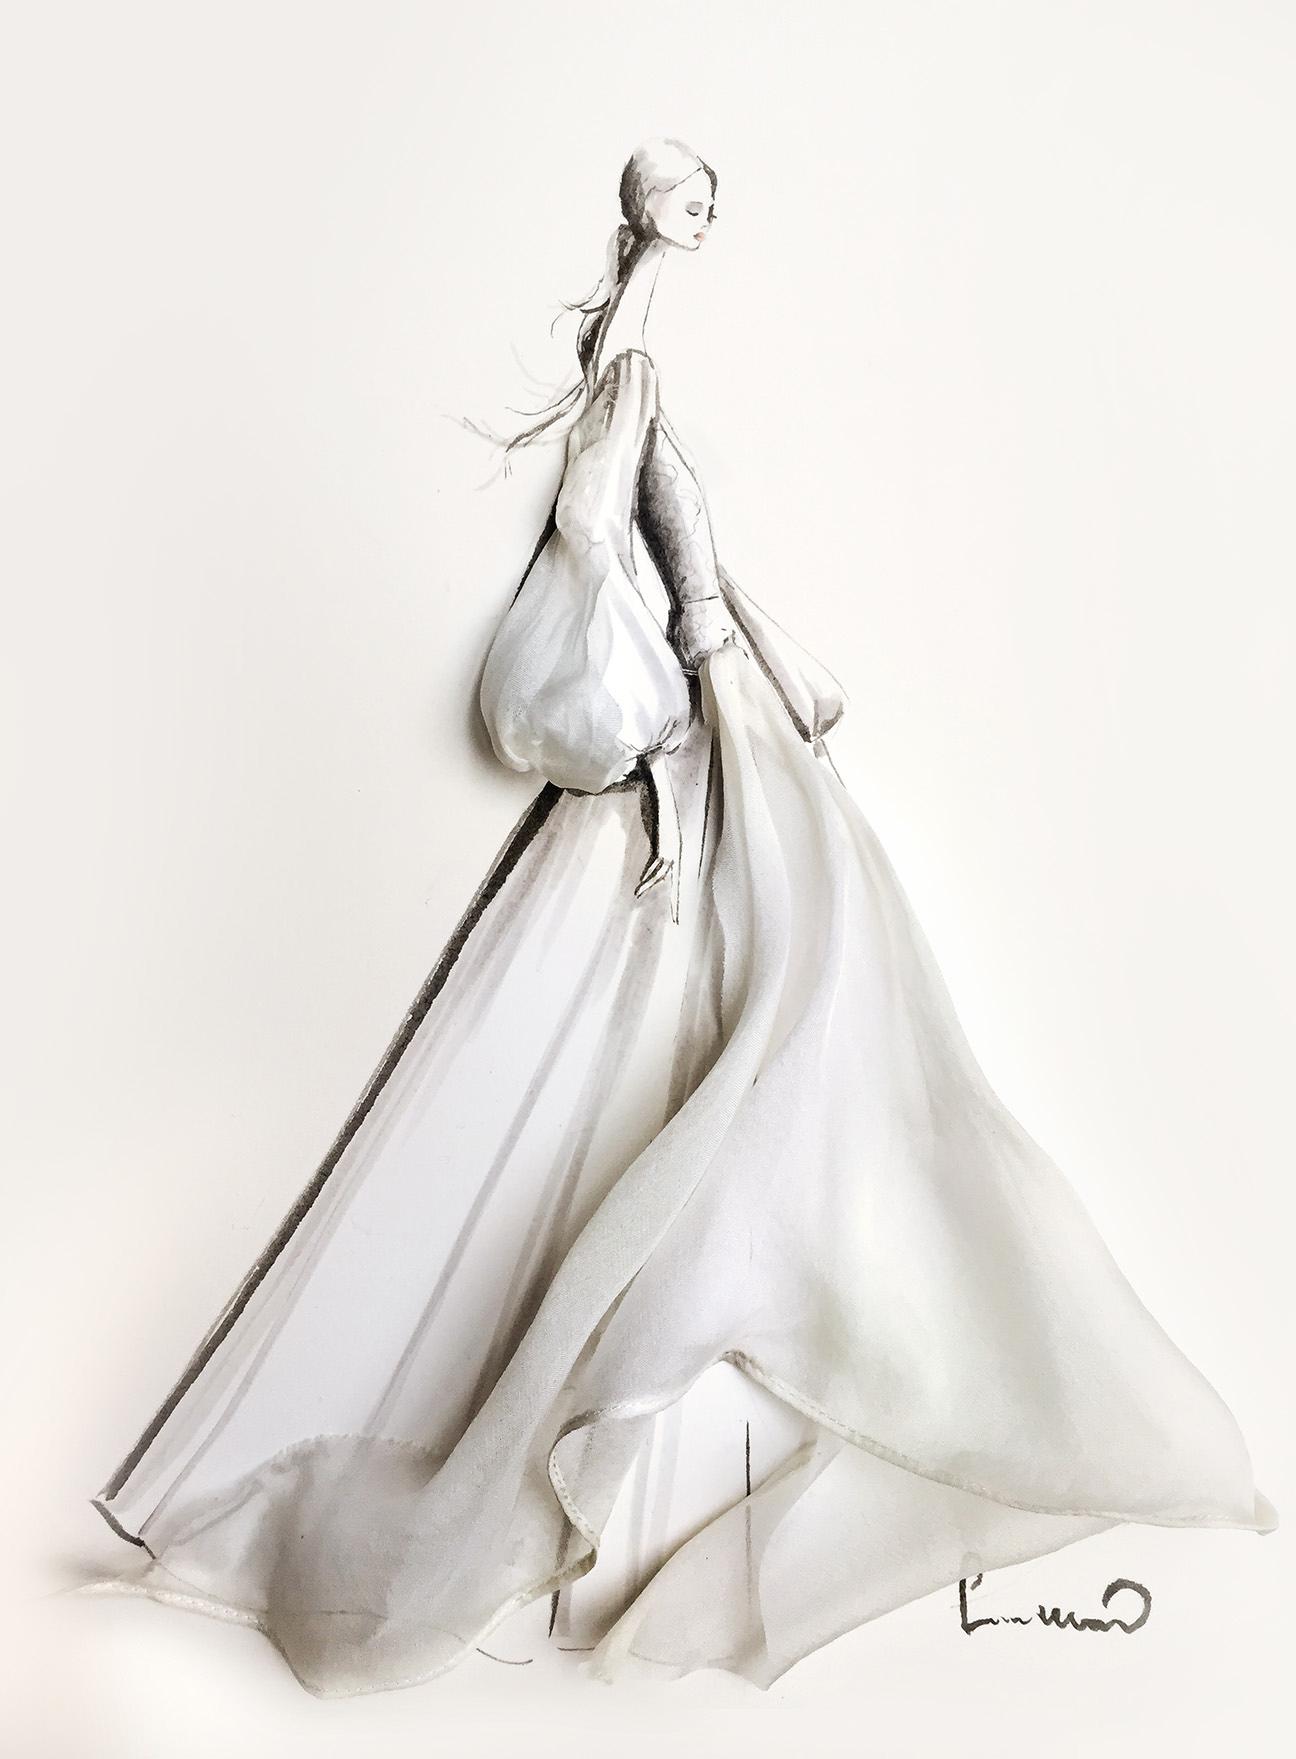 leanne marshall wedding dress sketch